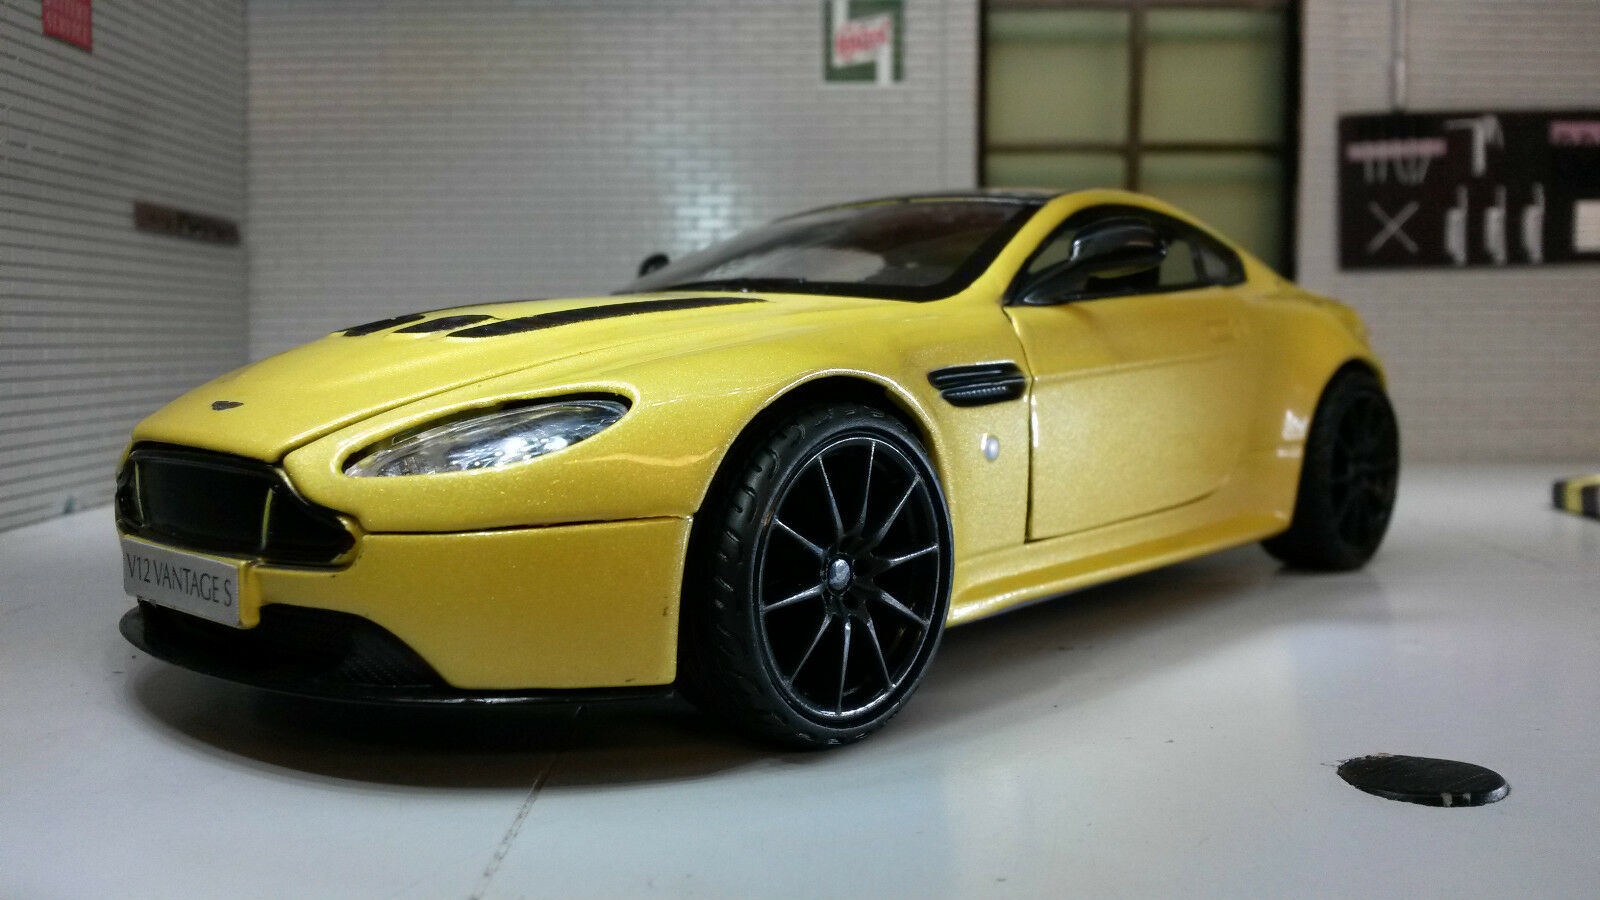 G 1:24 Echelle Aston Martin Bond Vantage V12 79322 V Détail Motormax Modèle Car